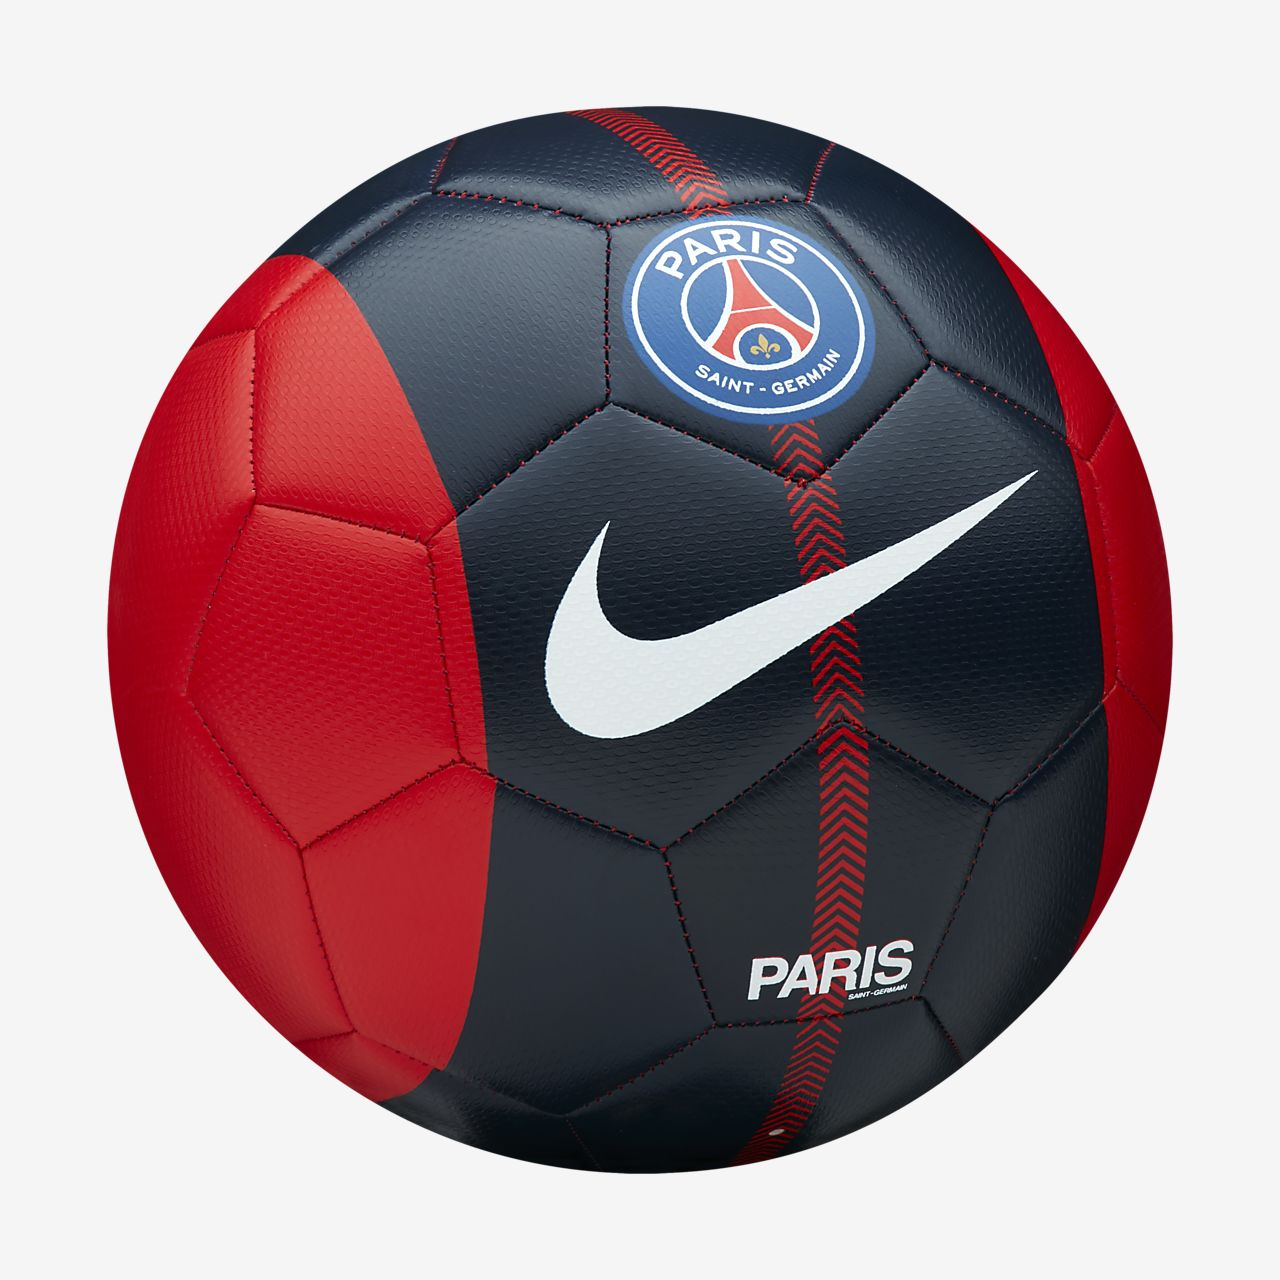 Ballon de football Paris Saint-Germain Prestige